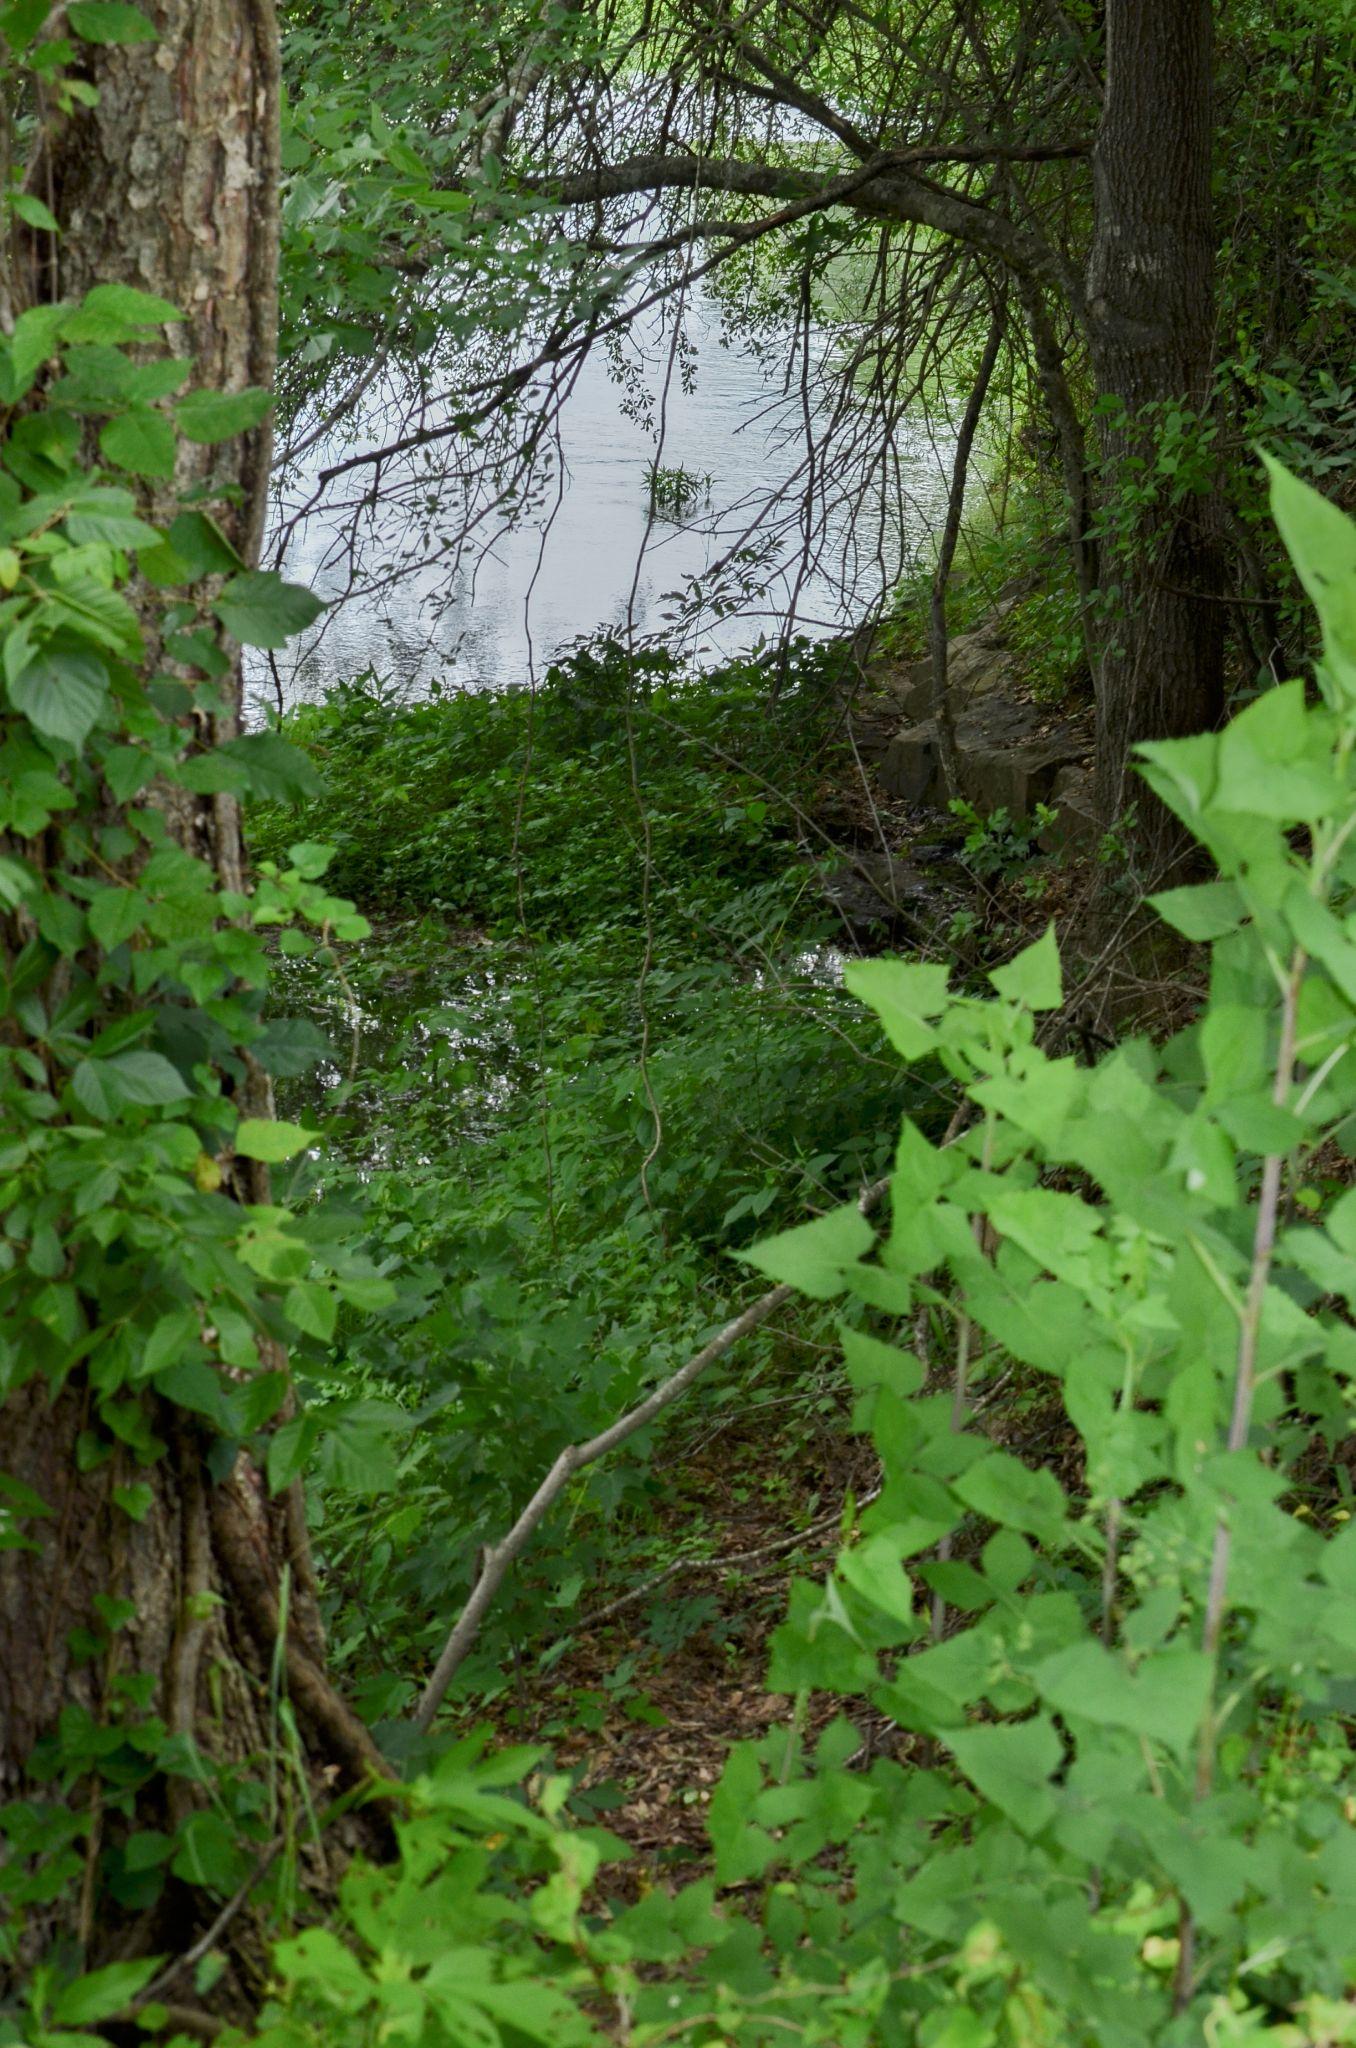 Peek into nature by Bernice Thompson